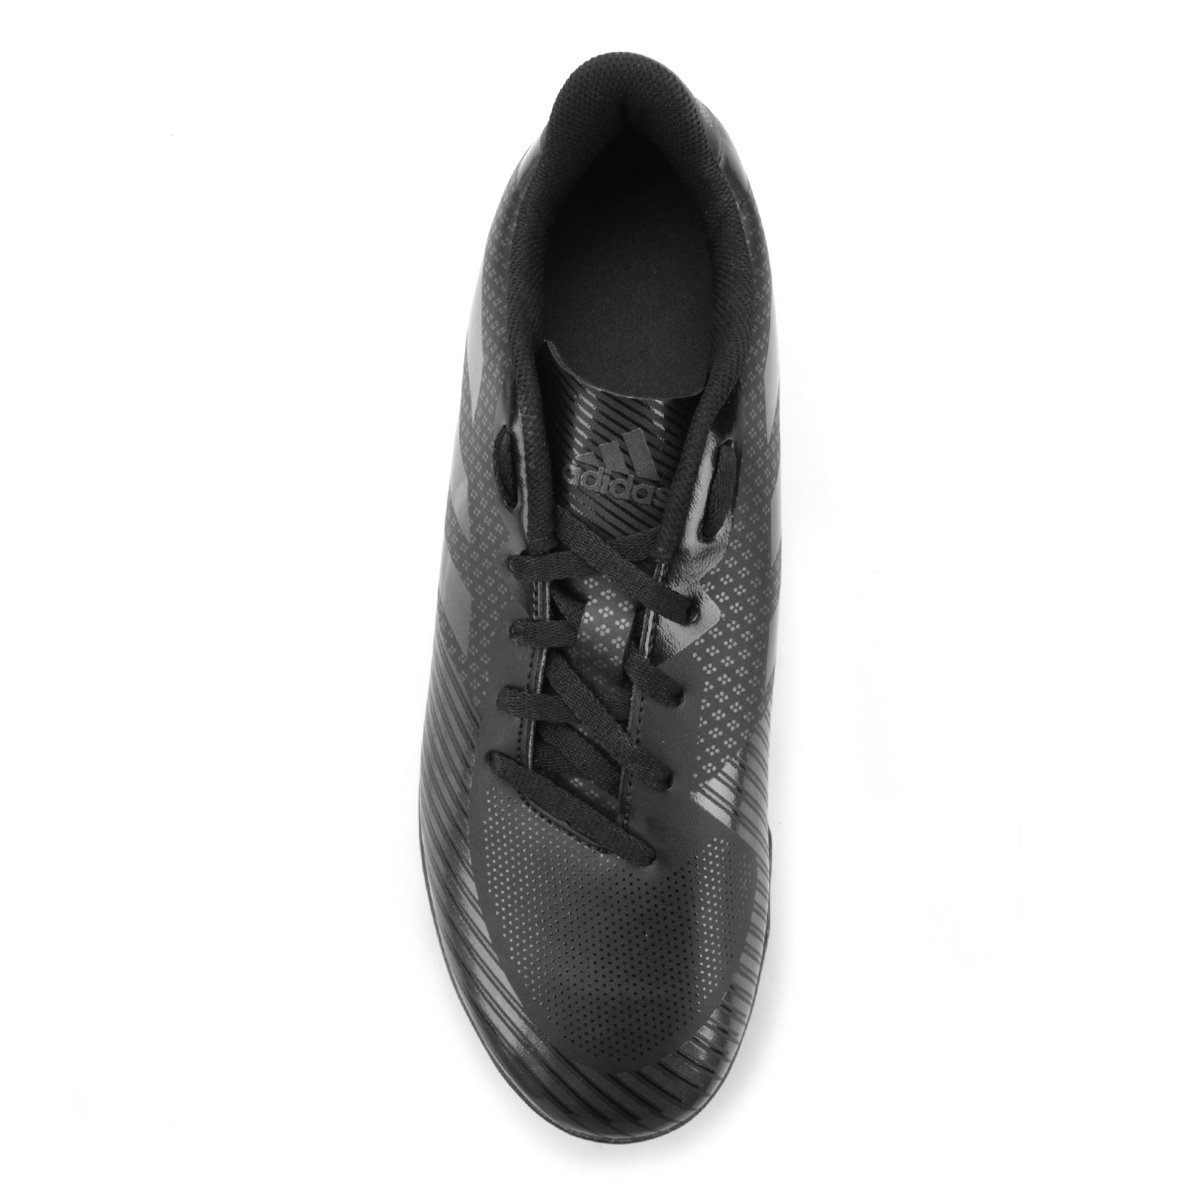 ... Society TF Adidas Adidas Masculina Chuteira 18 Chuteira Preto Artilheira  Society qwxwHUBaCn ... e13c79bb63ef5